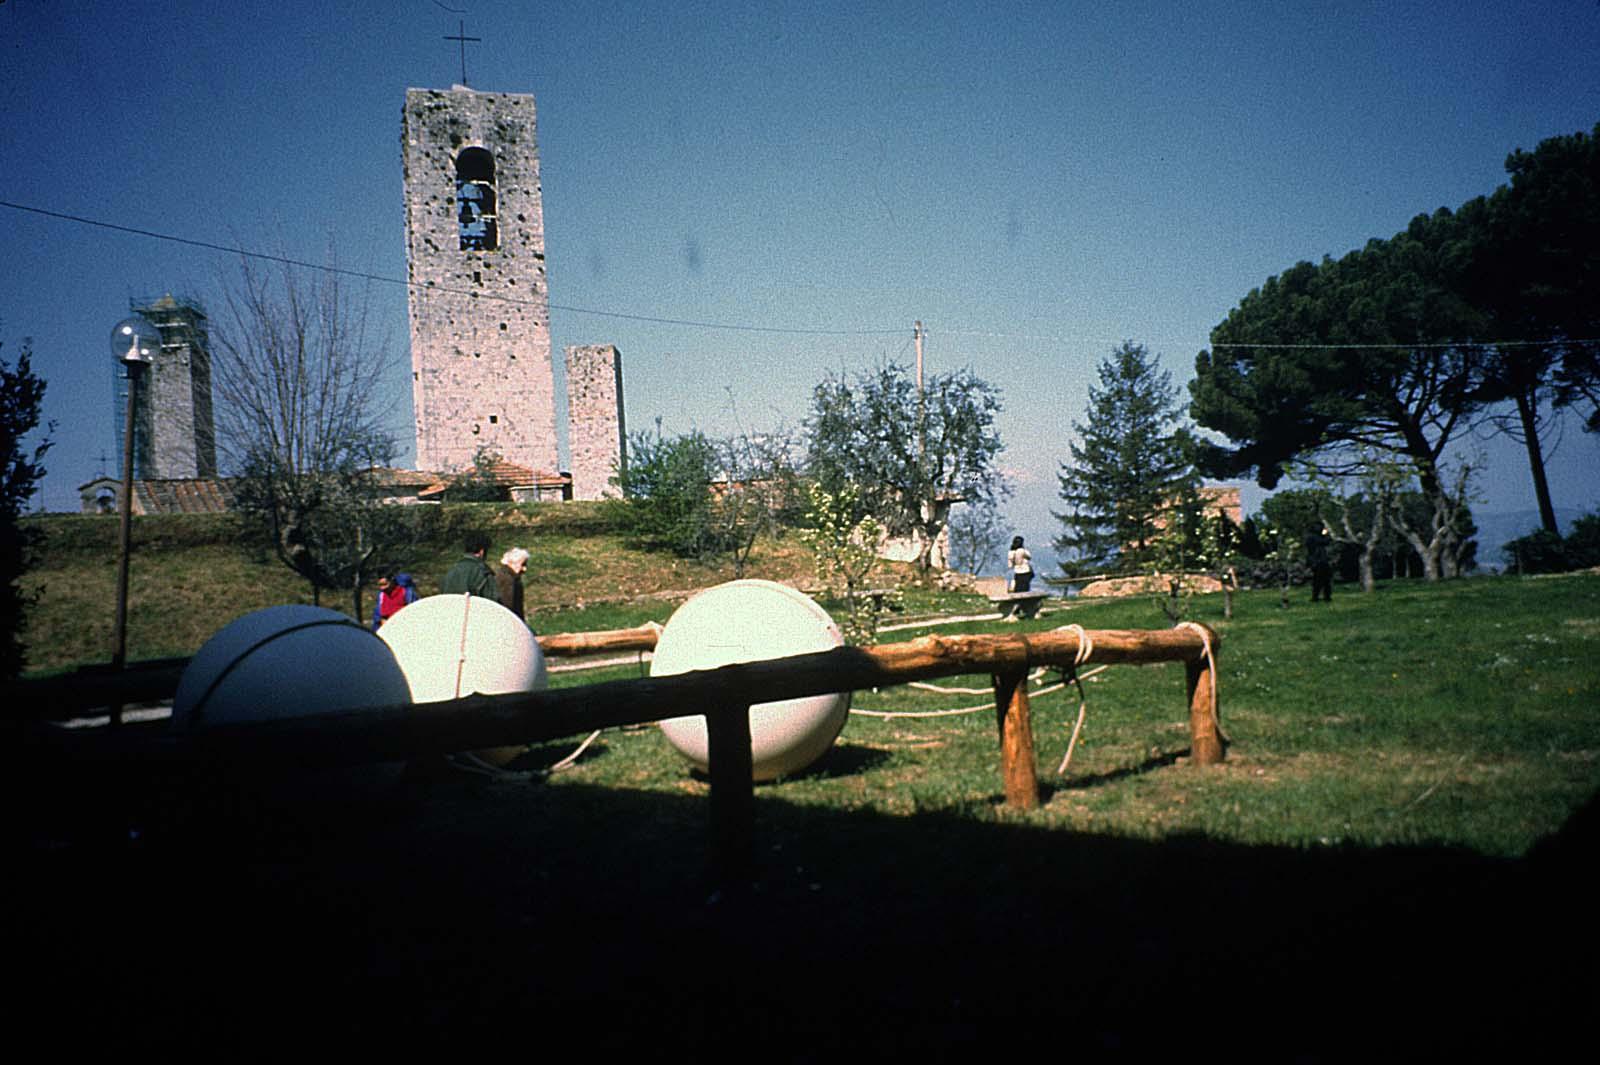 View-of-installation-San-Gimignano-2001-2.jpg